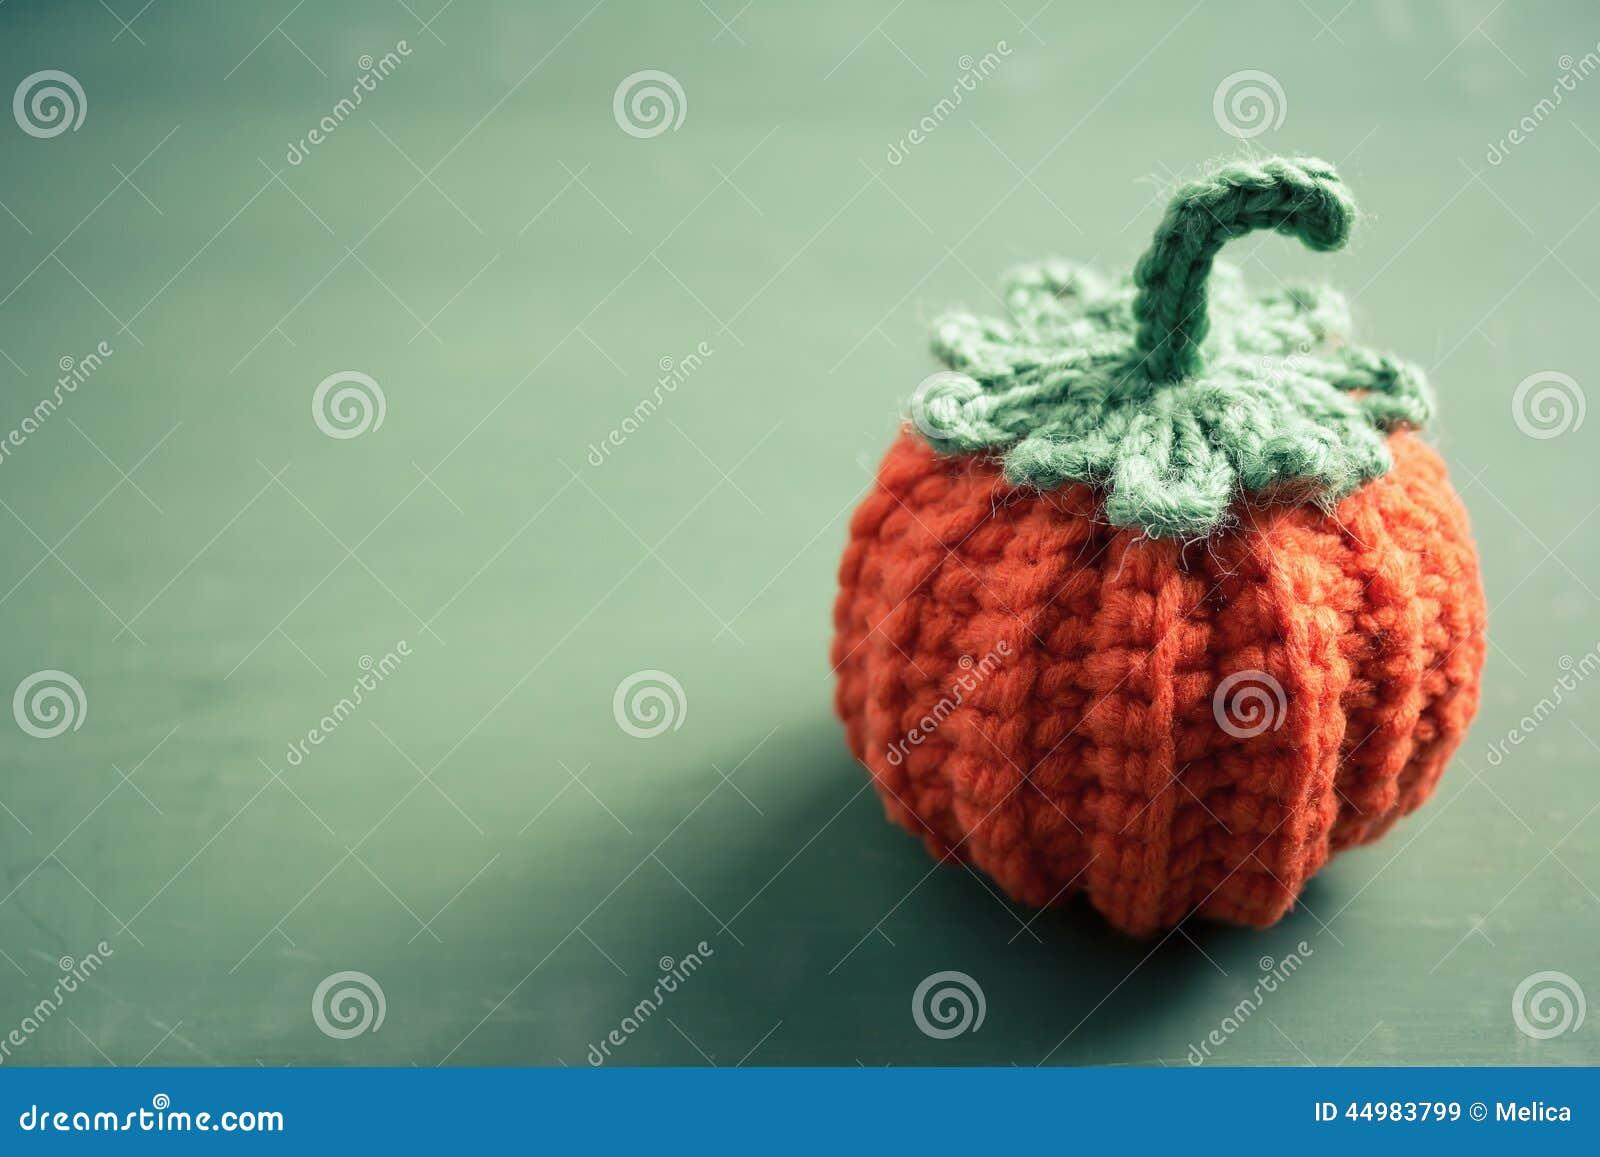 Halloween crochet for home decorating stock image image 44983799 - Decoration au crochet ...